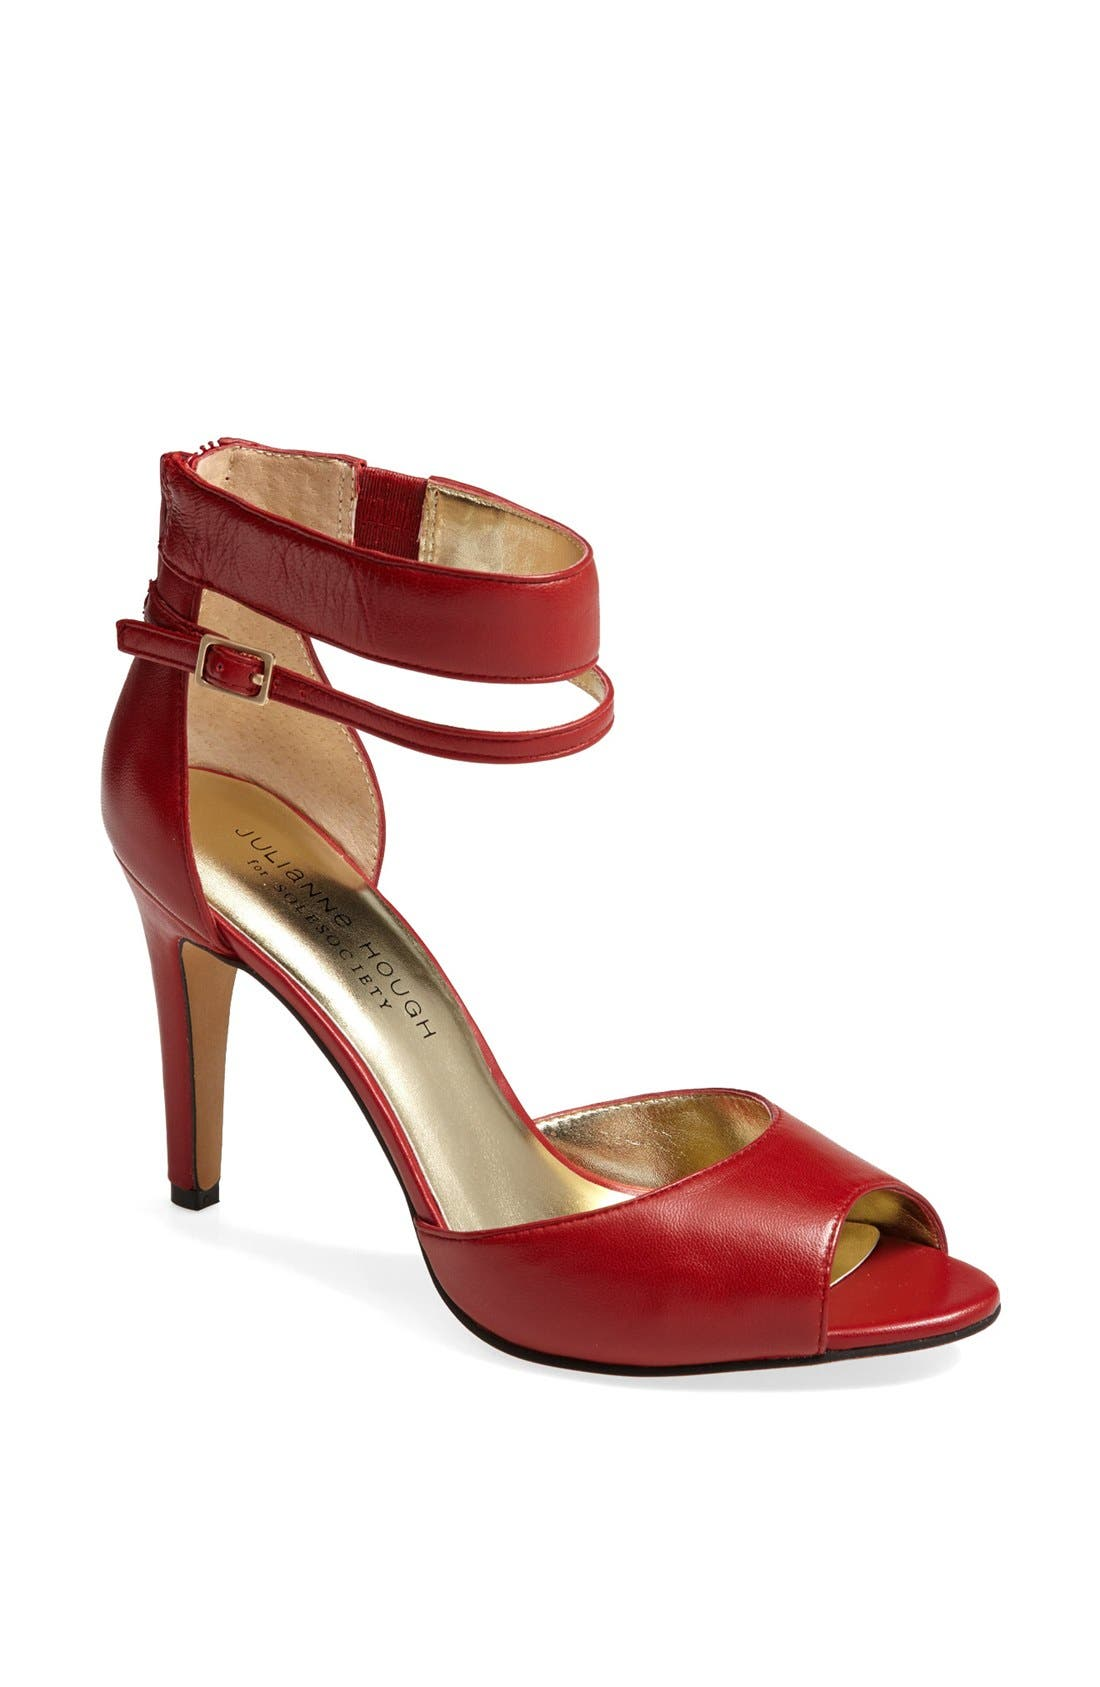 Main Image - Julianne Hough for Sole Society 'Denelle' Ankle Strap Sandal